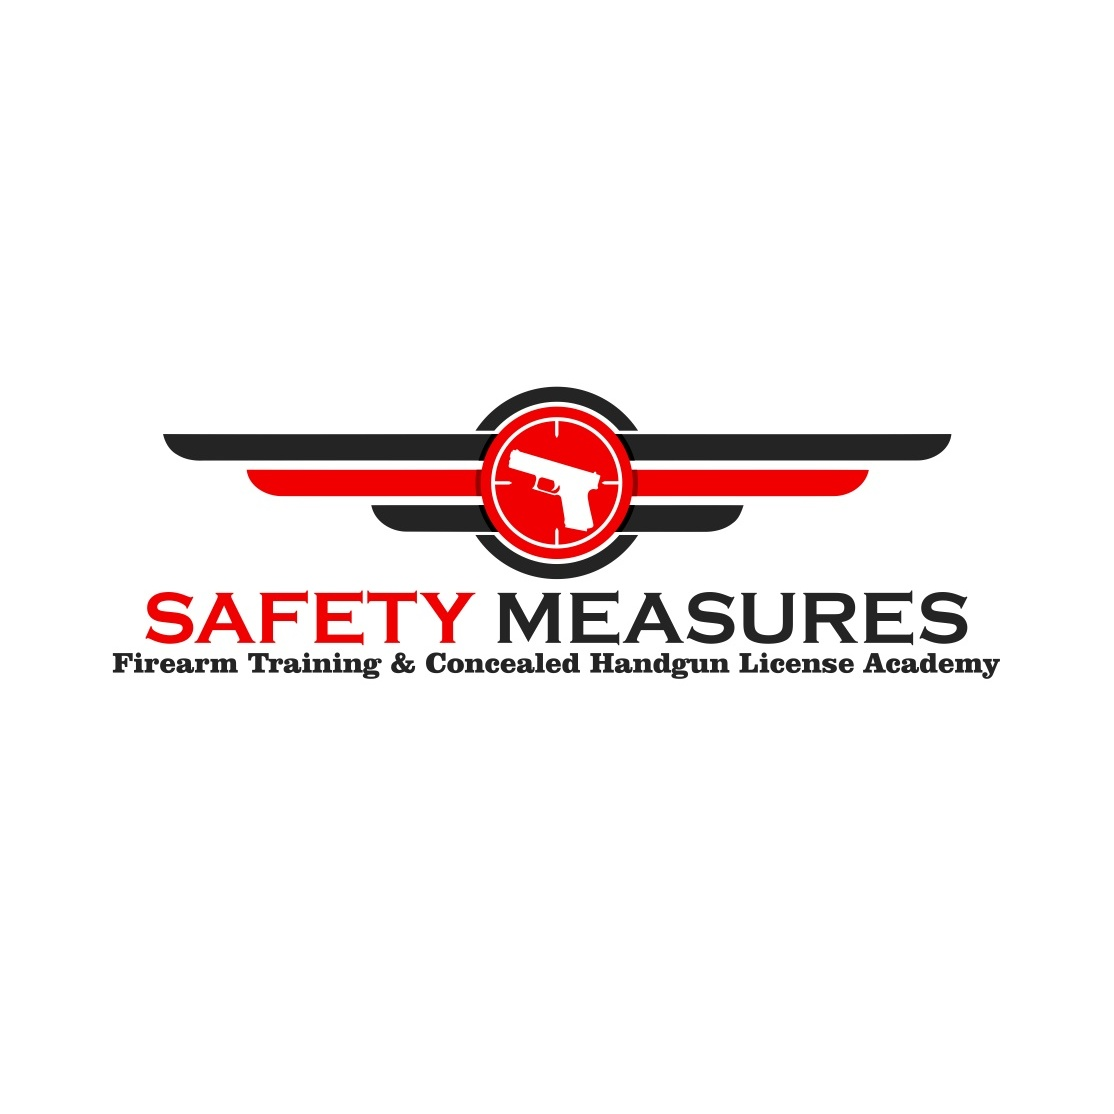 Safety Measures LLC